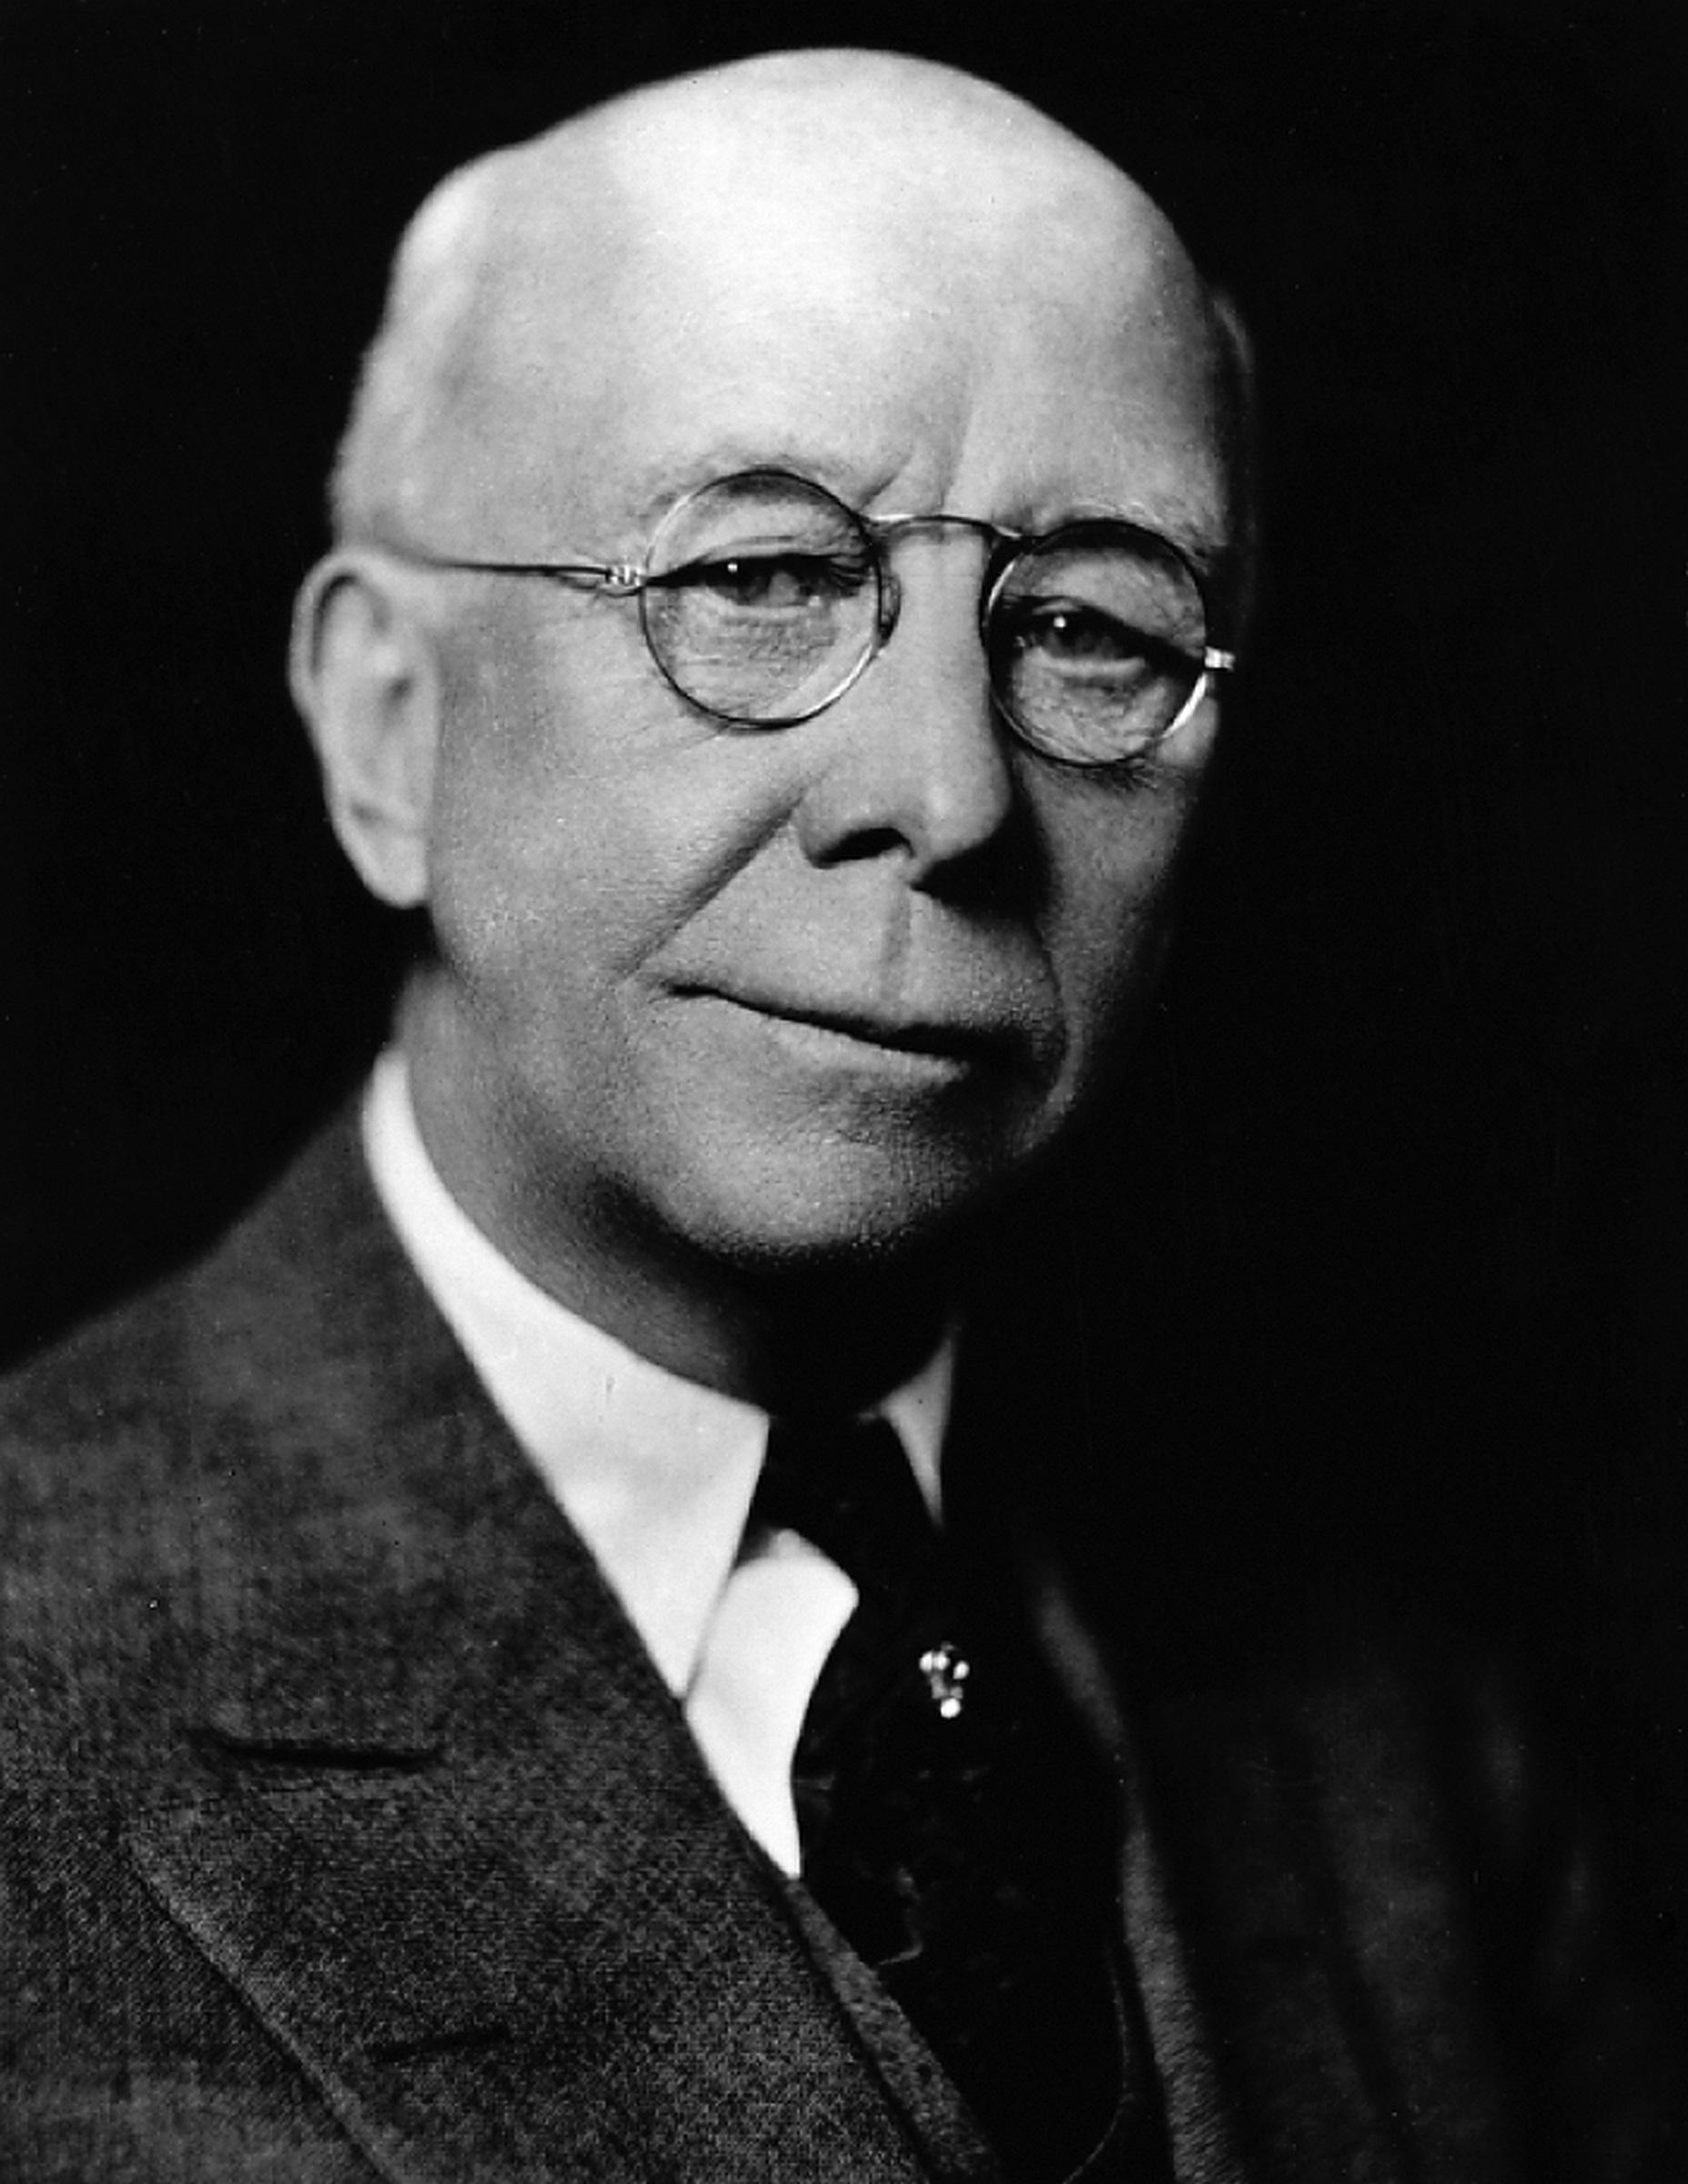 James Joseph Haverty